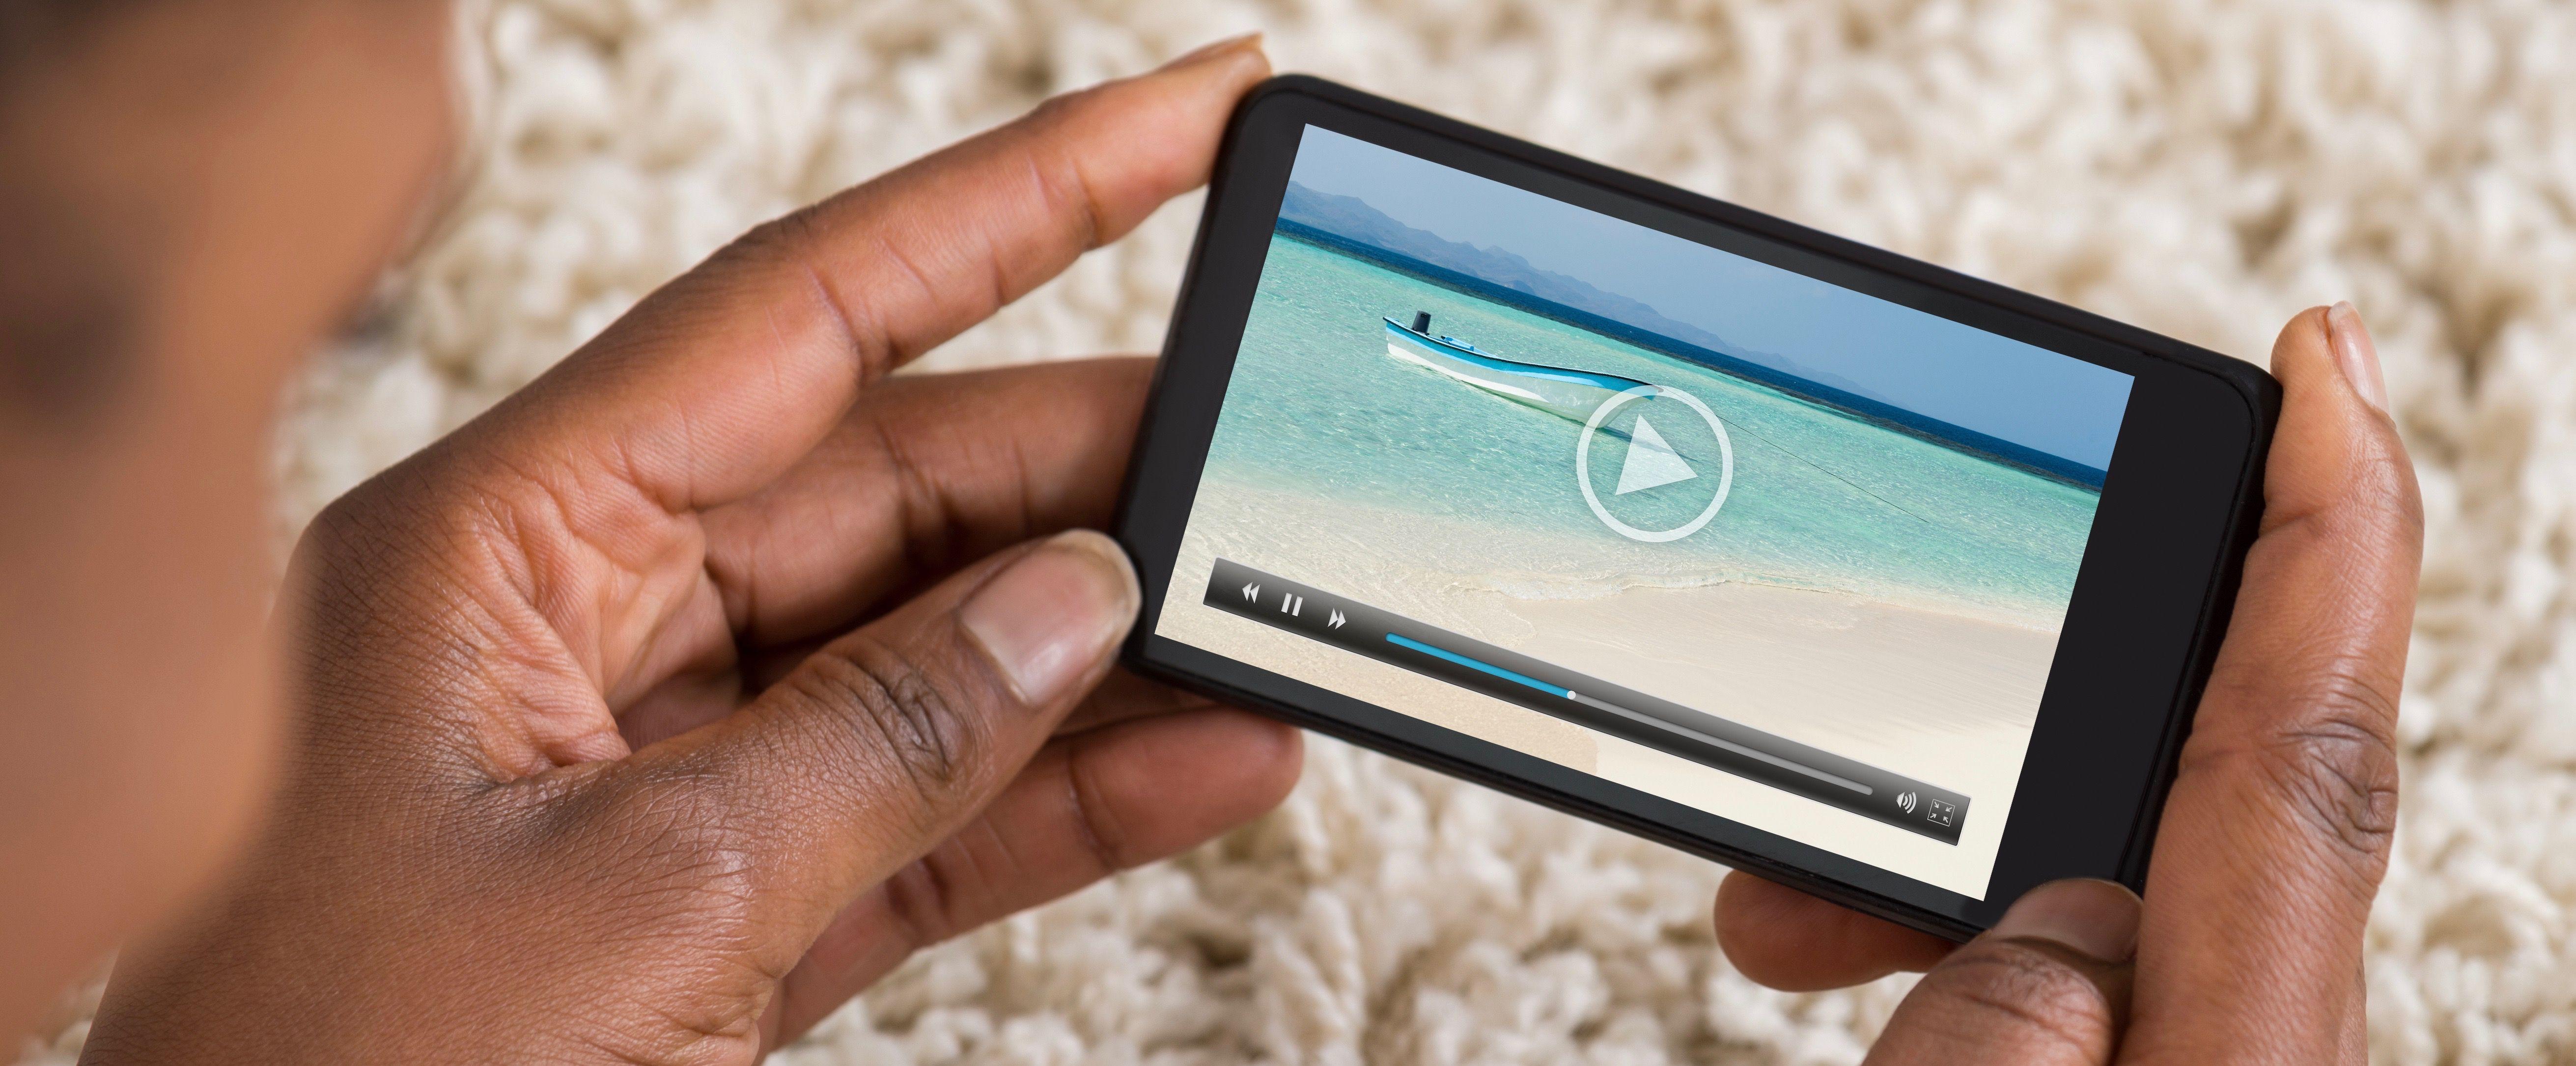 video-marketing-statistics-compressor.jpg